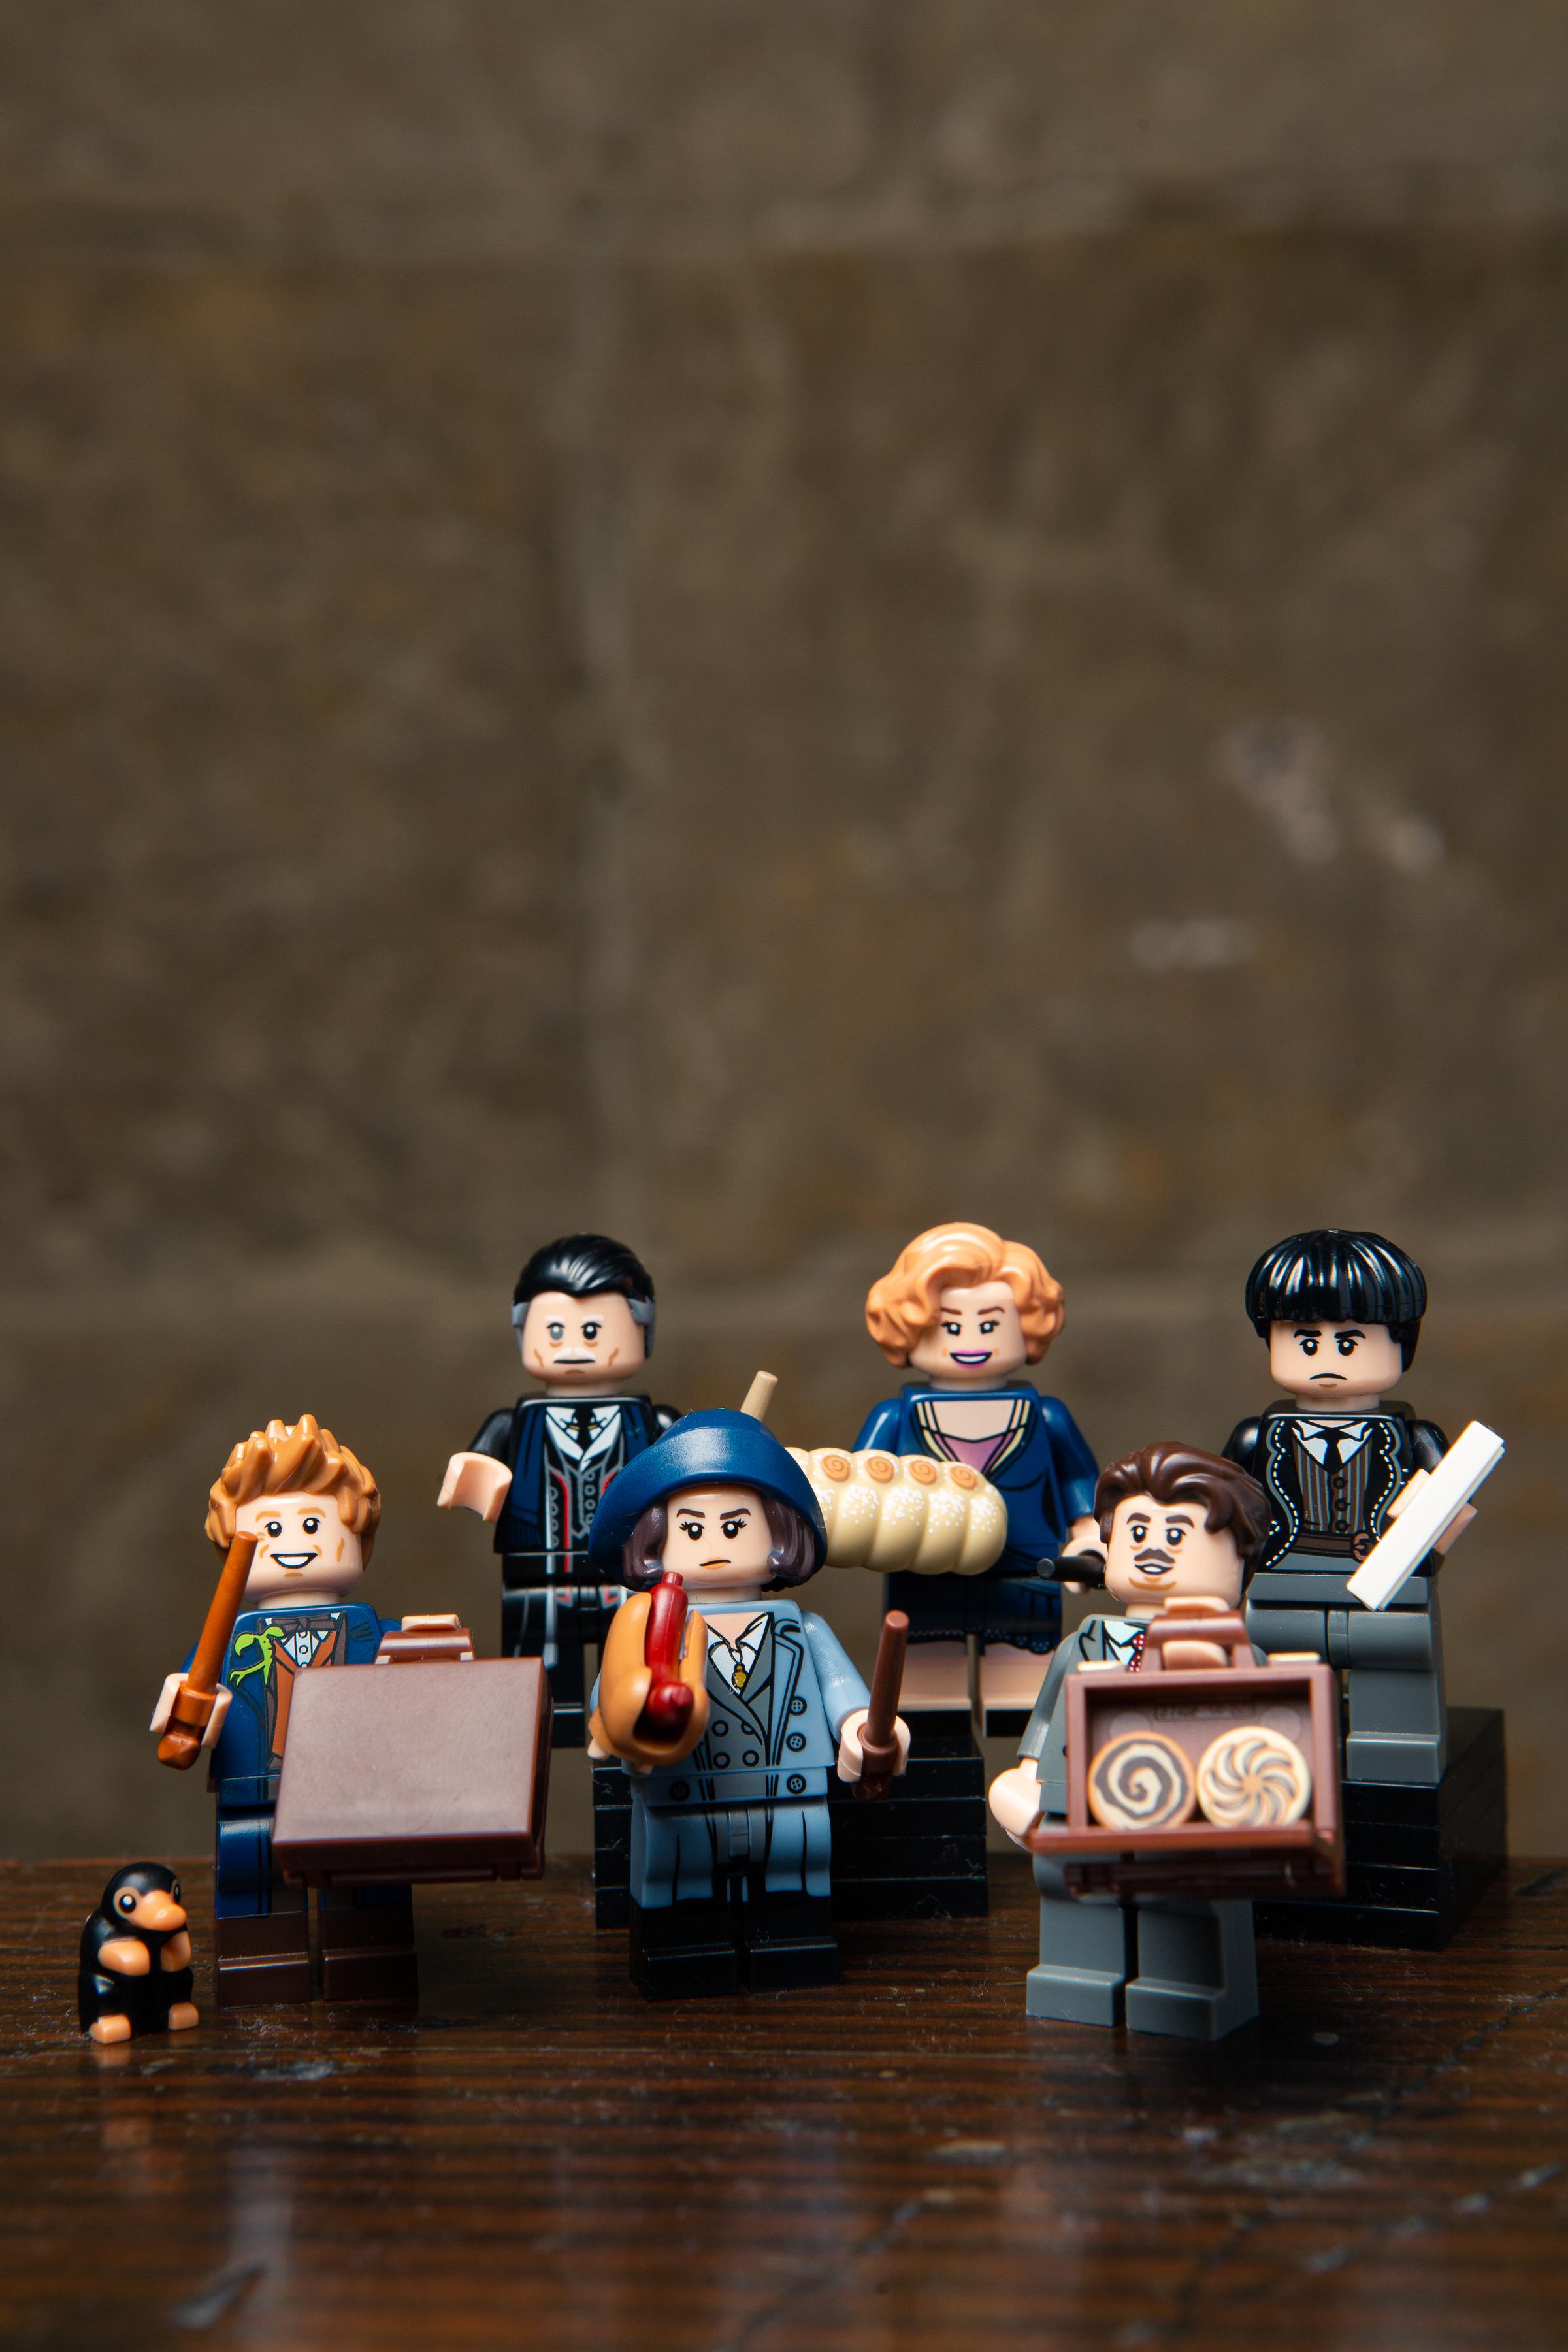 LEGO_WBST_19.06.18_hi-res-7.jpg